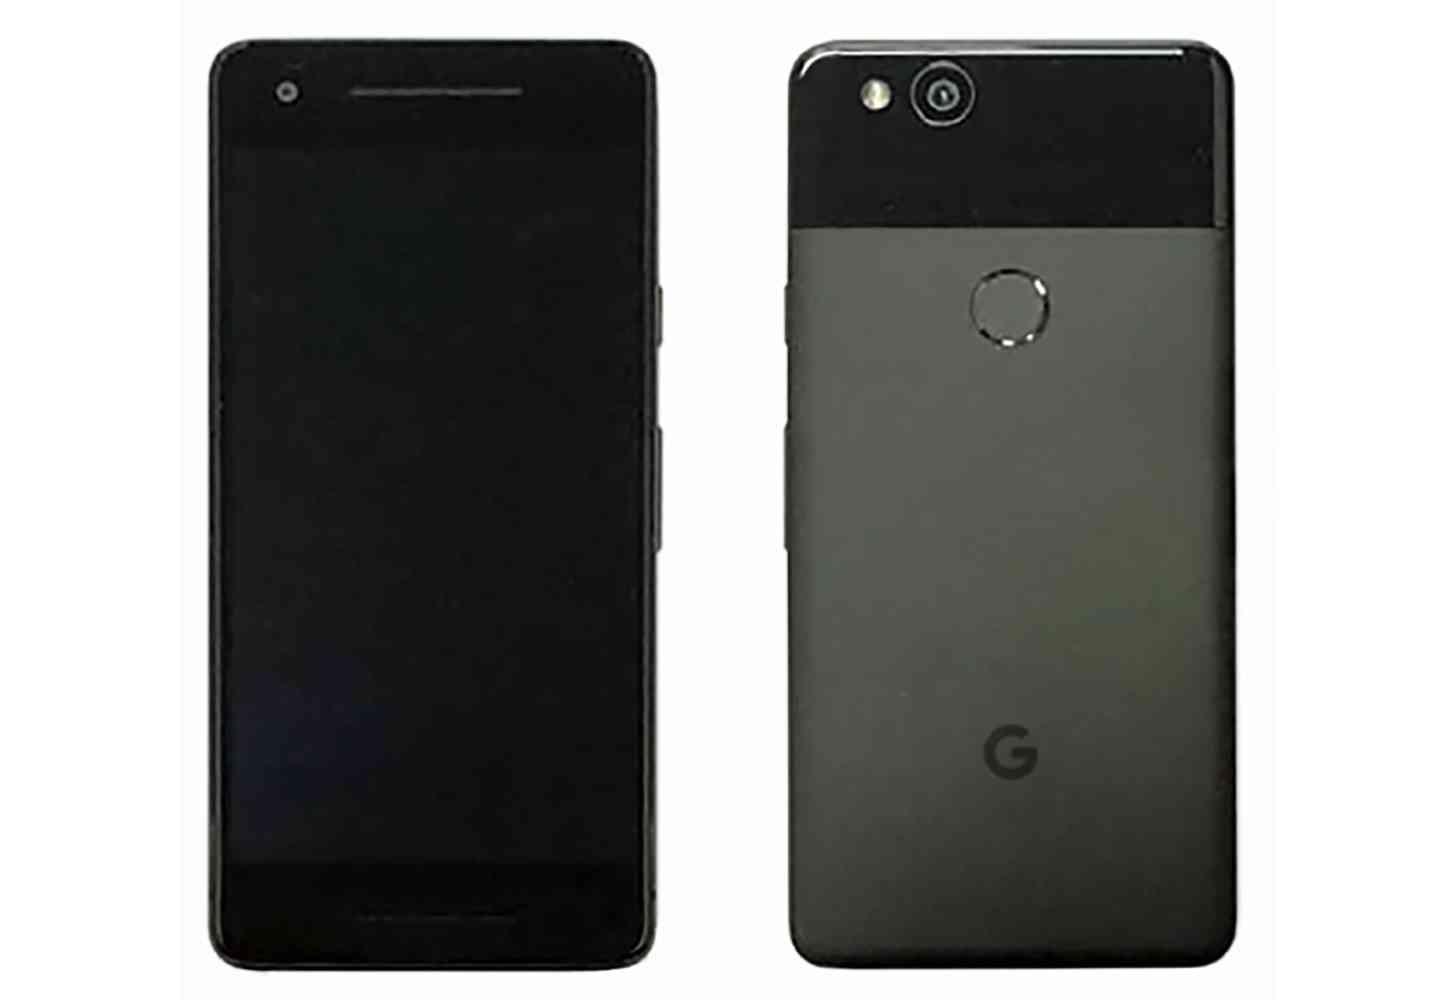 Google Pixel 2 image leak